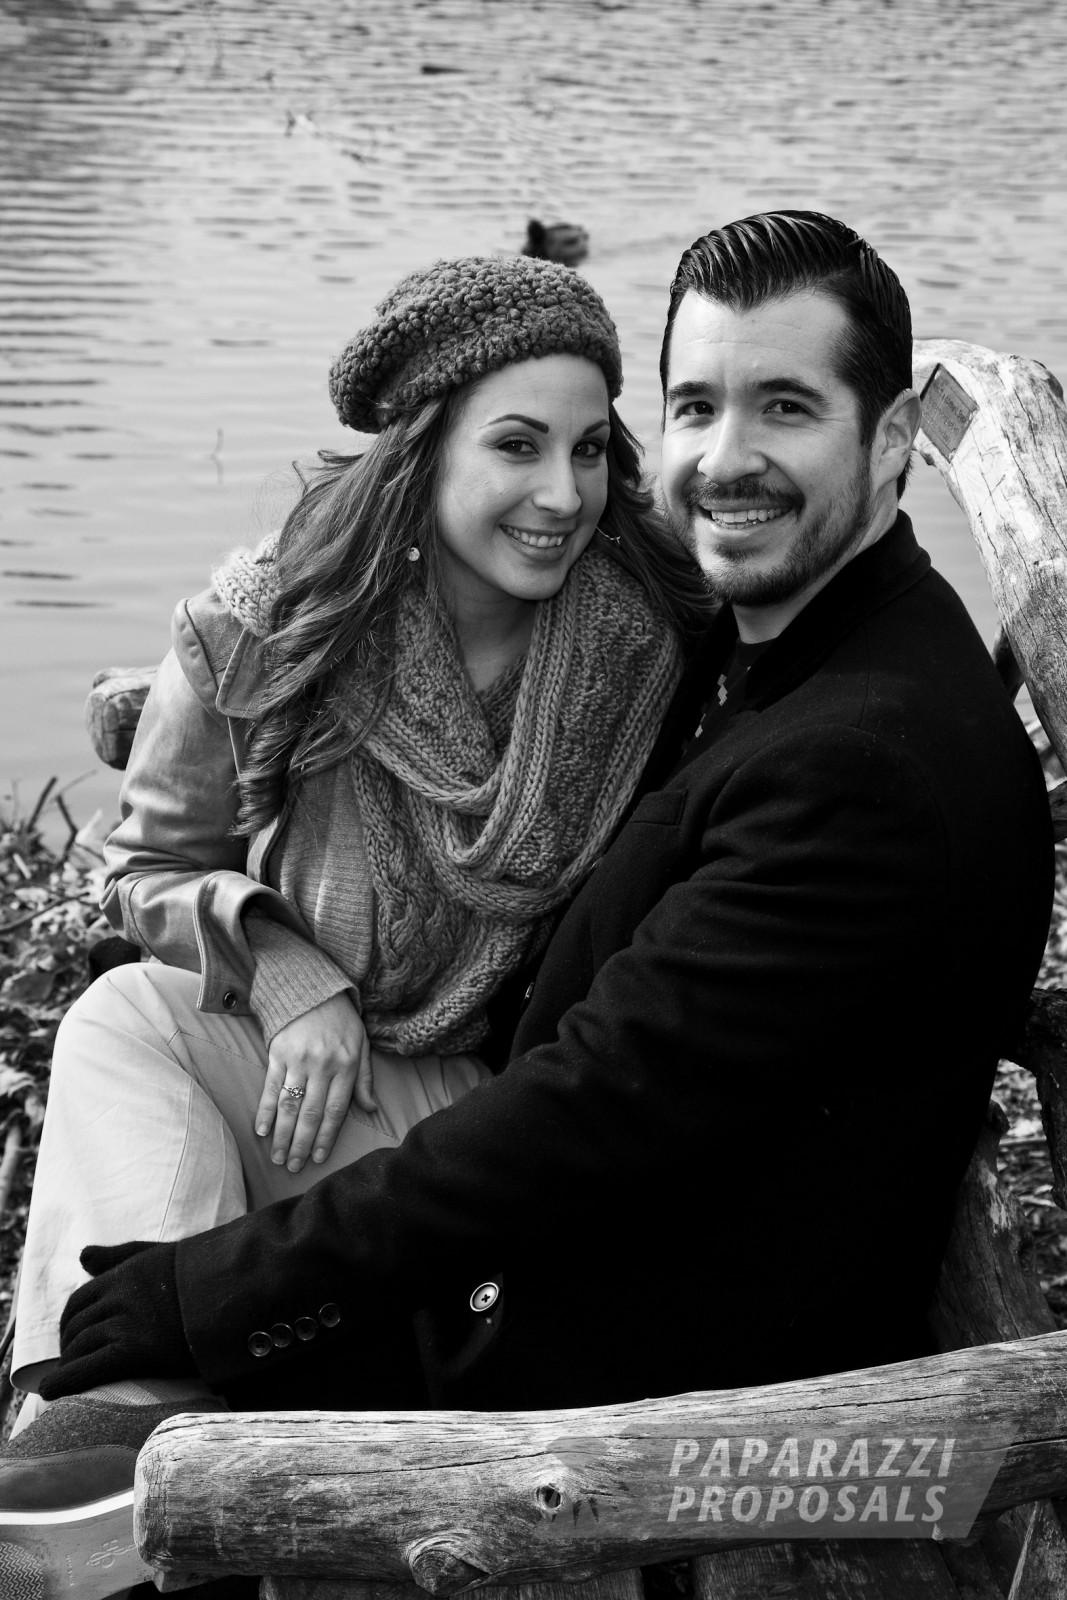 Stephen And Catherine S Bow Bridge Paparazzi Proposal New York Paparazzi Proposals